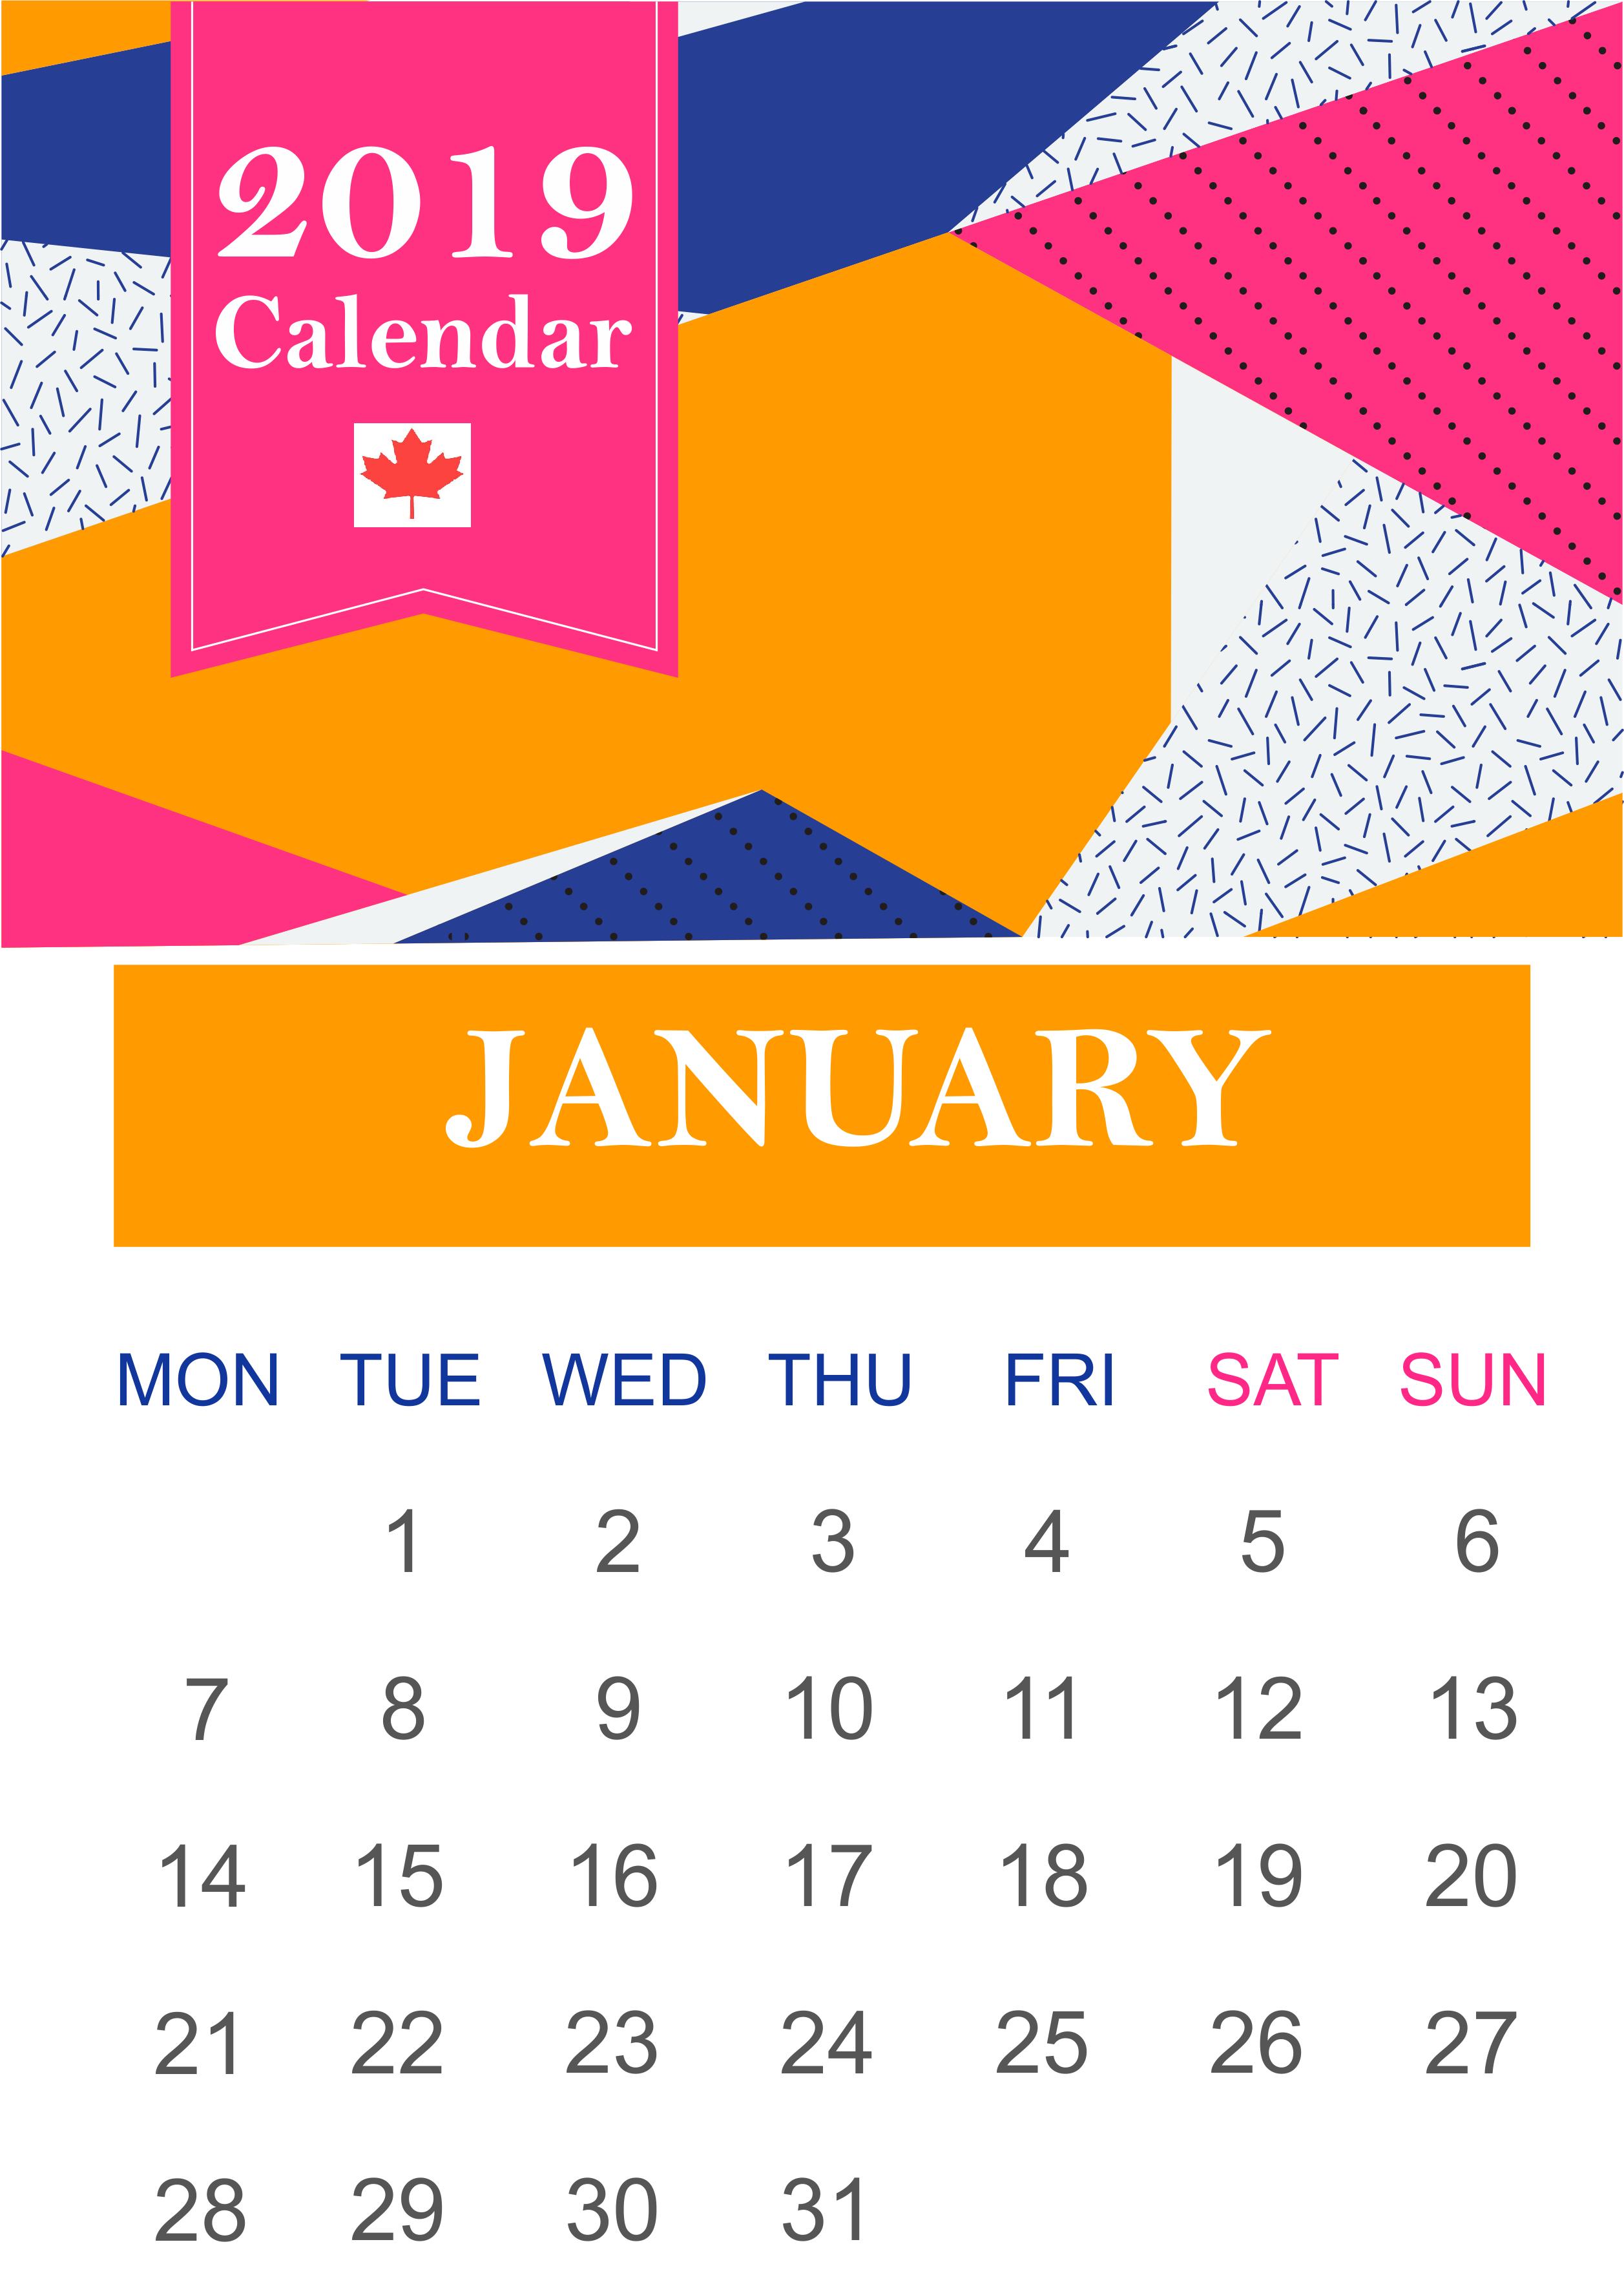 january 2019 national holiday canada calendar